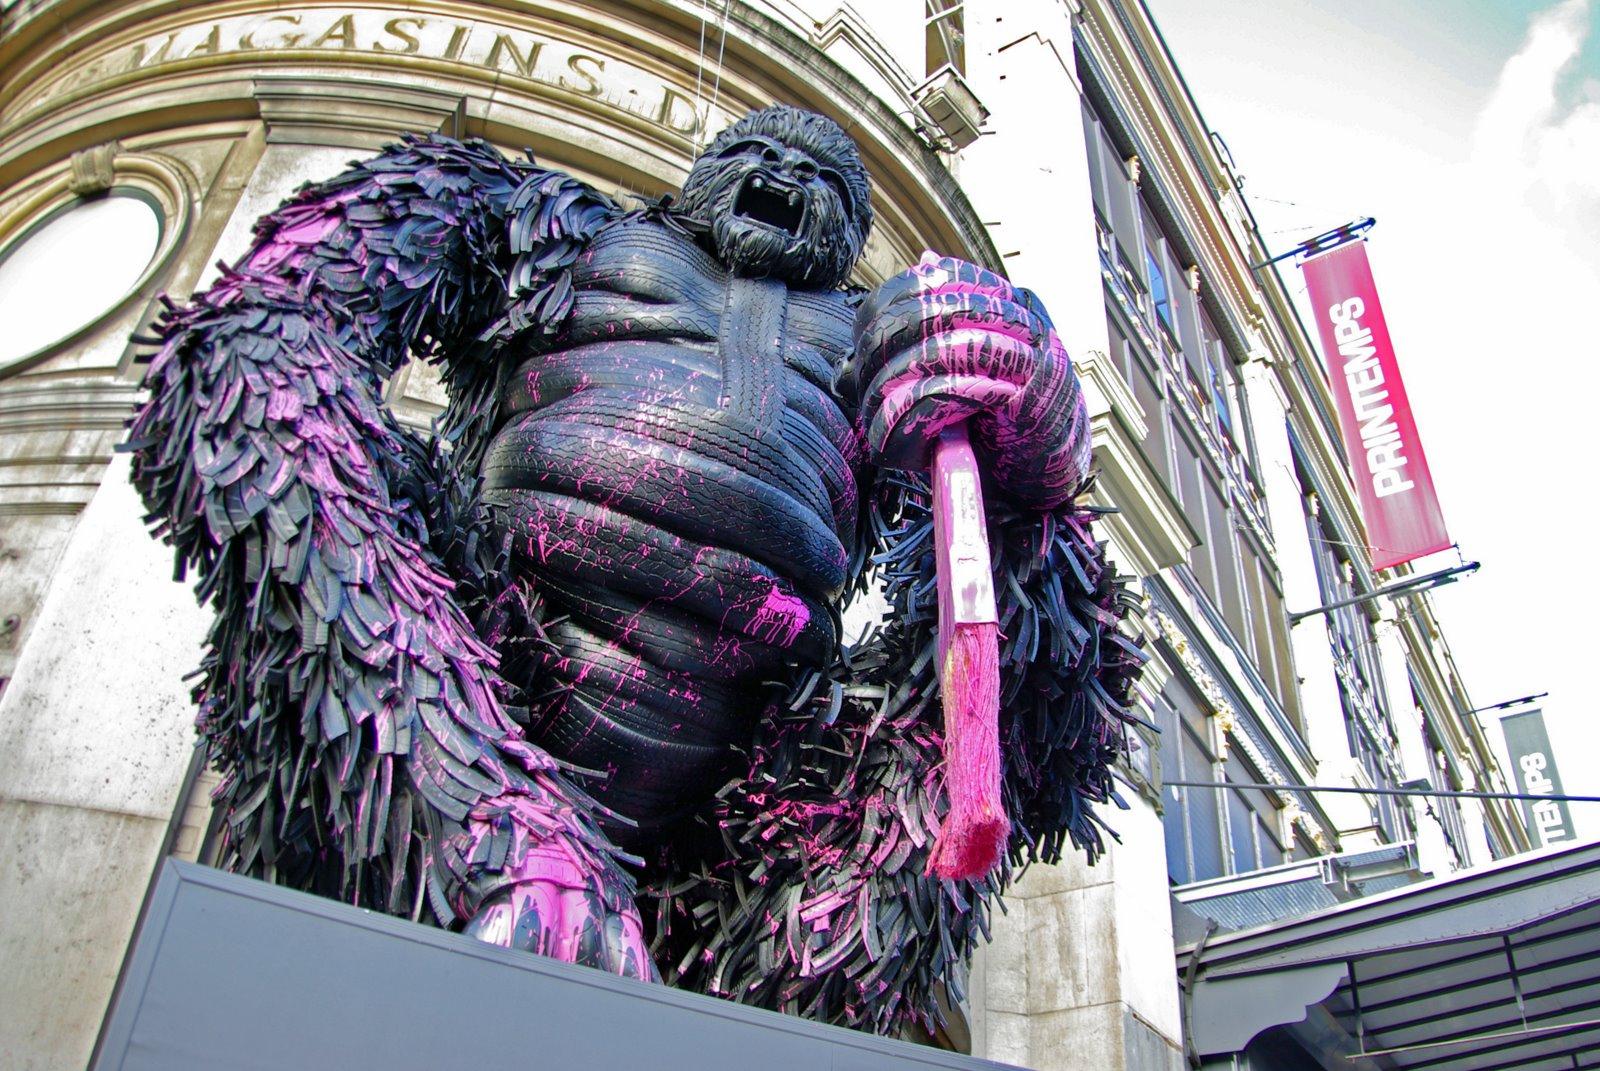 ParisDailyPhoto: King Kong in Paris